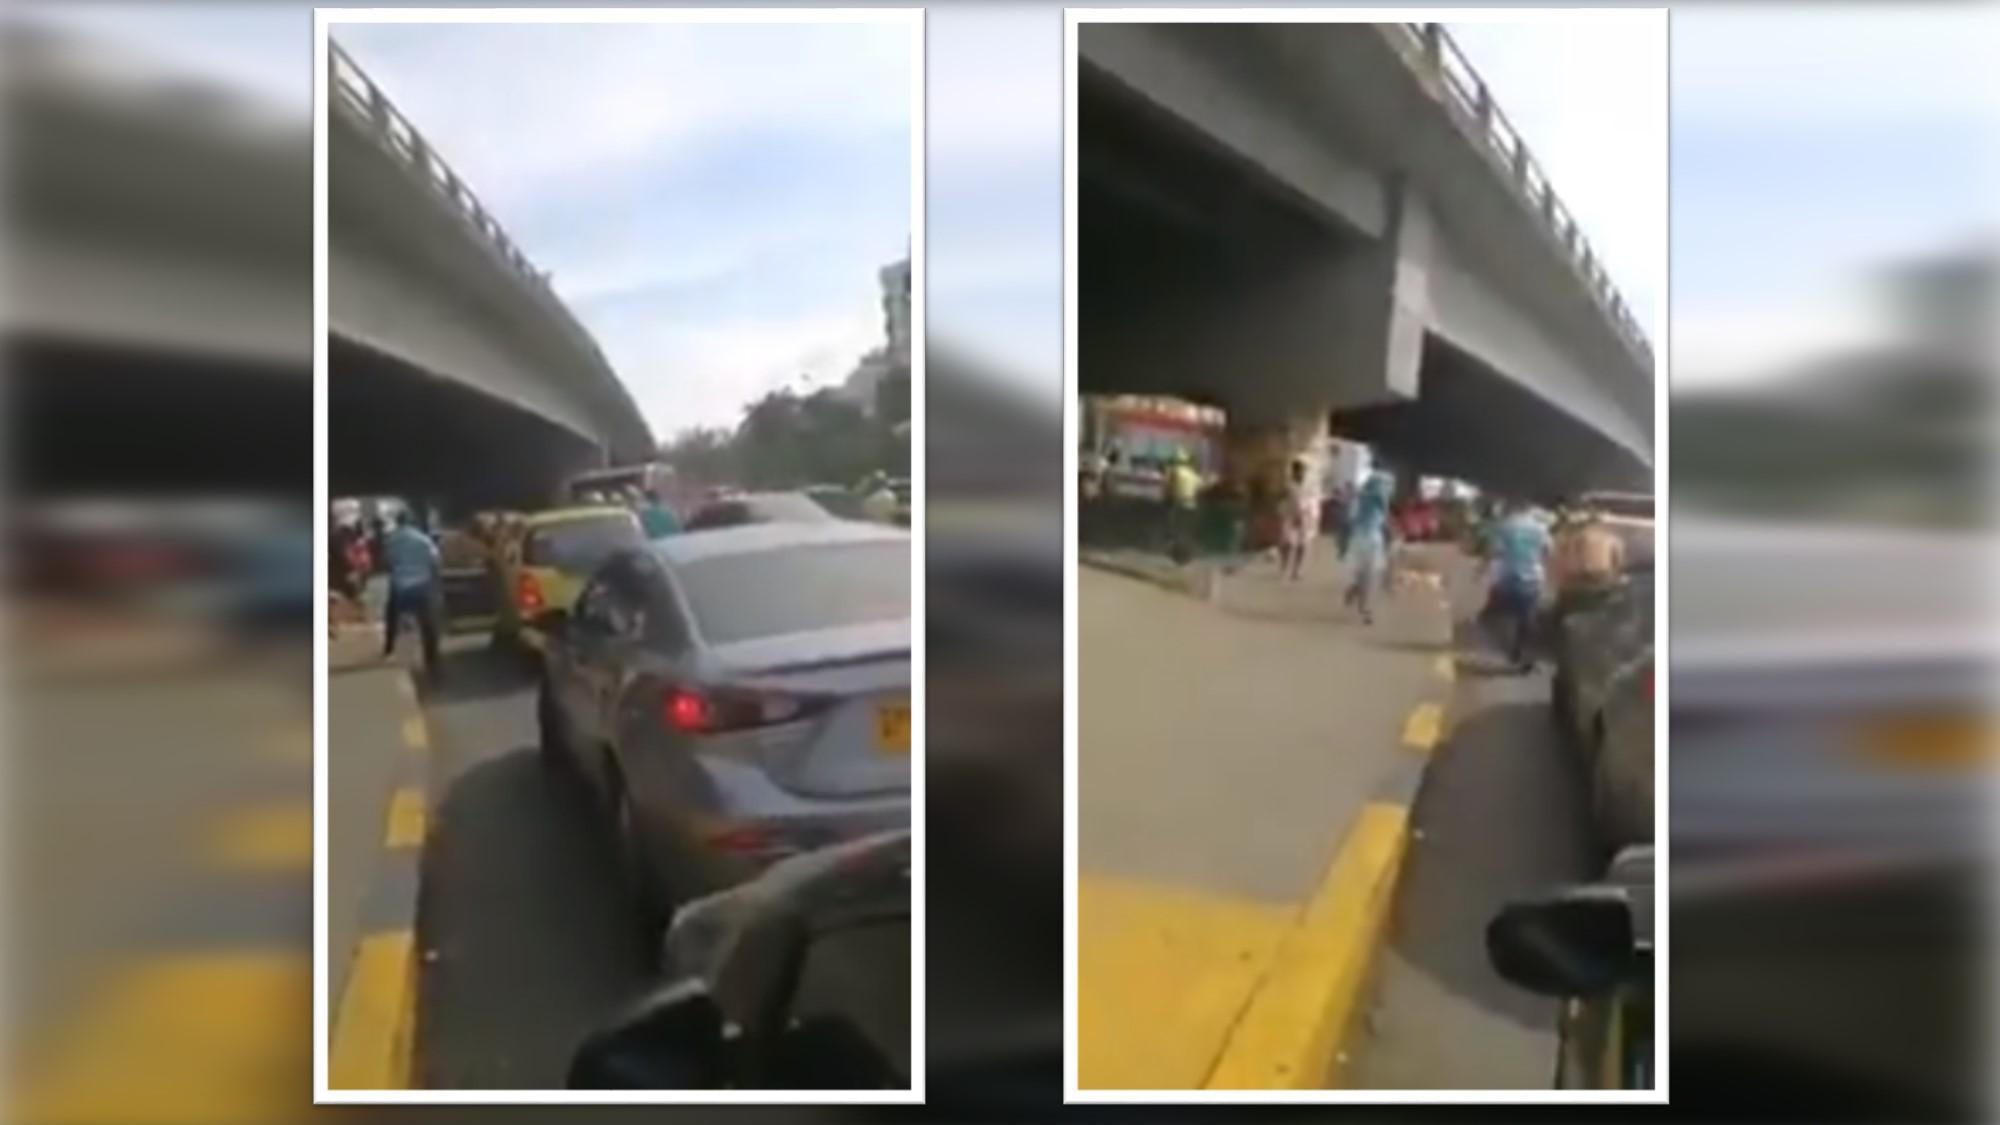 Limpiavidrios atacaron a taxista que se negó a pagar por servicio en la Autopista Sur